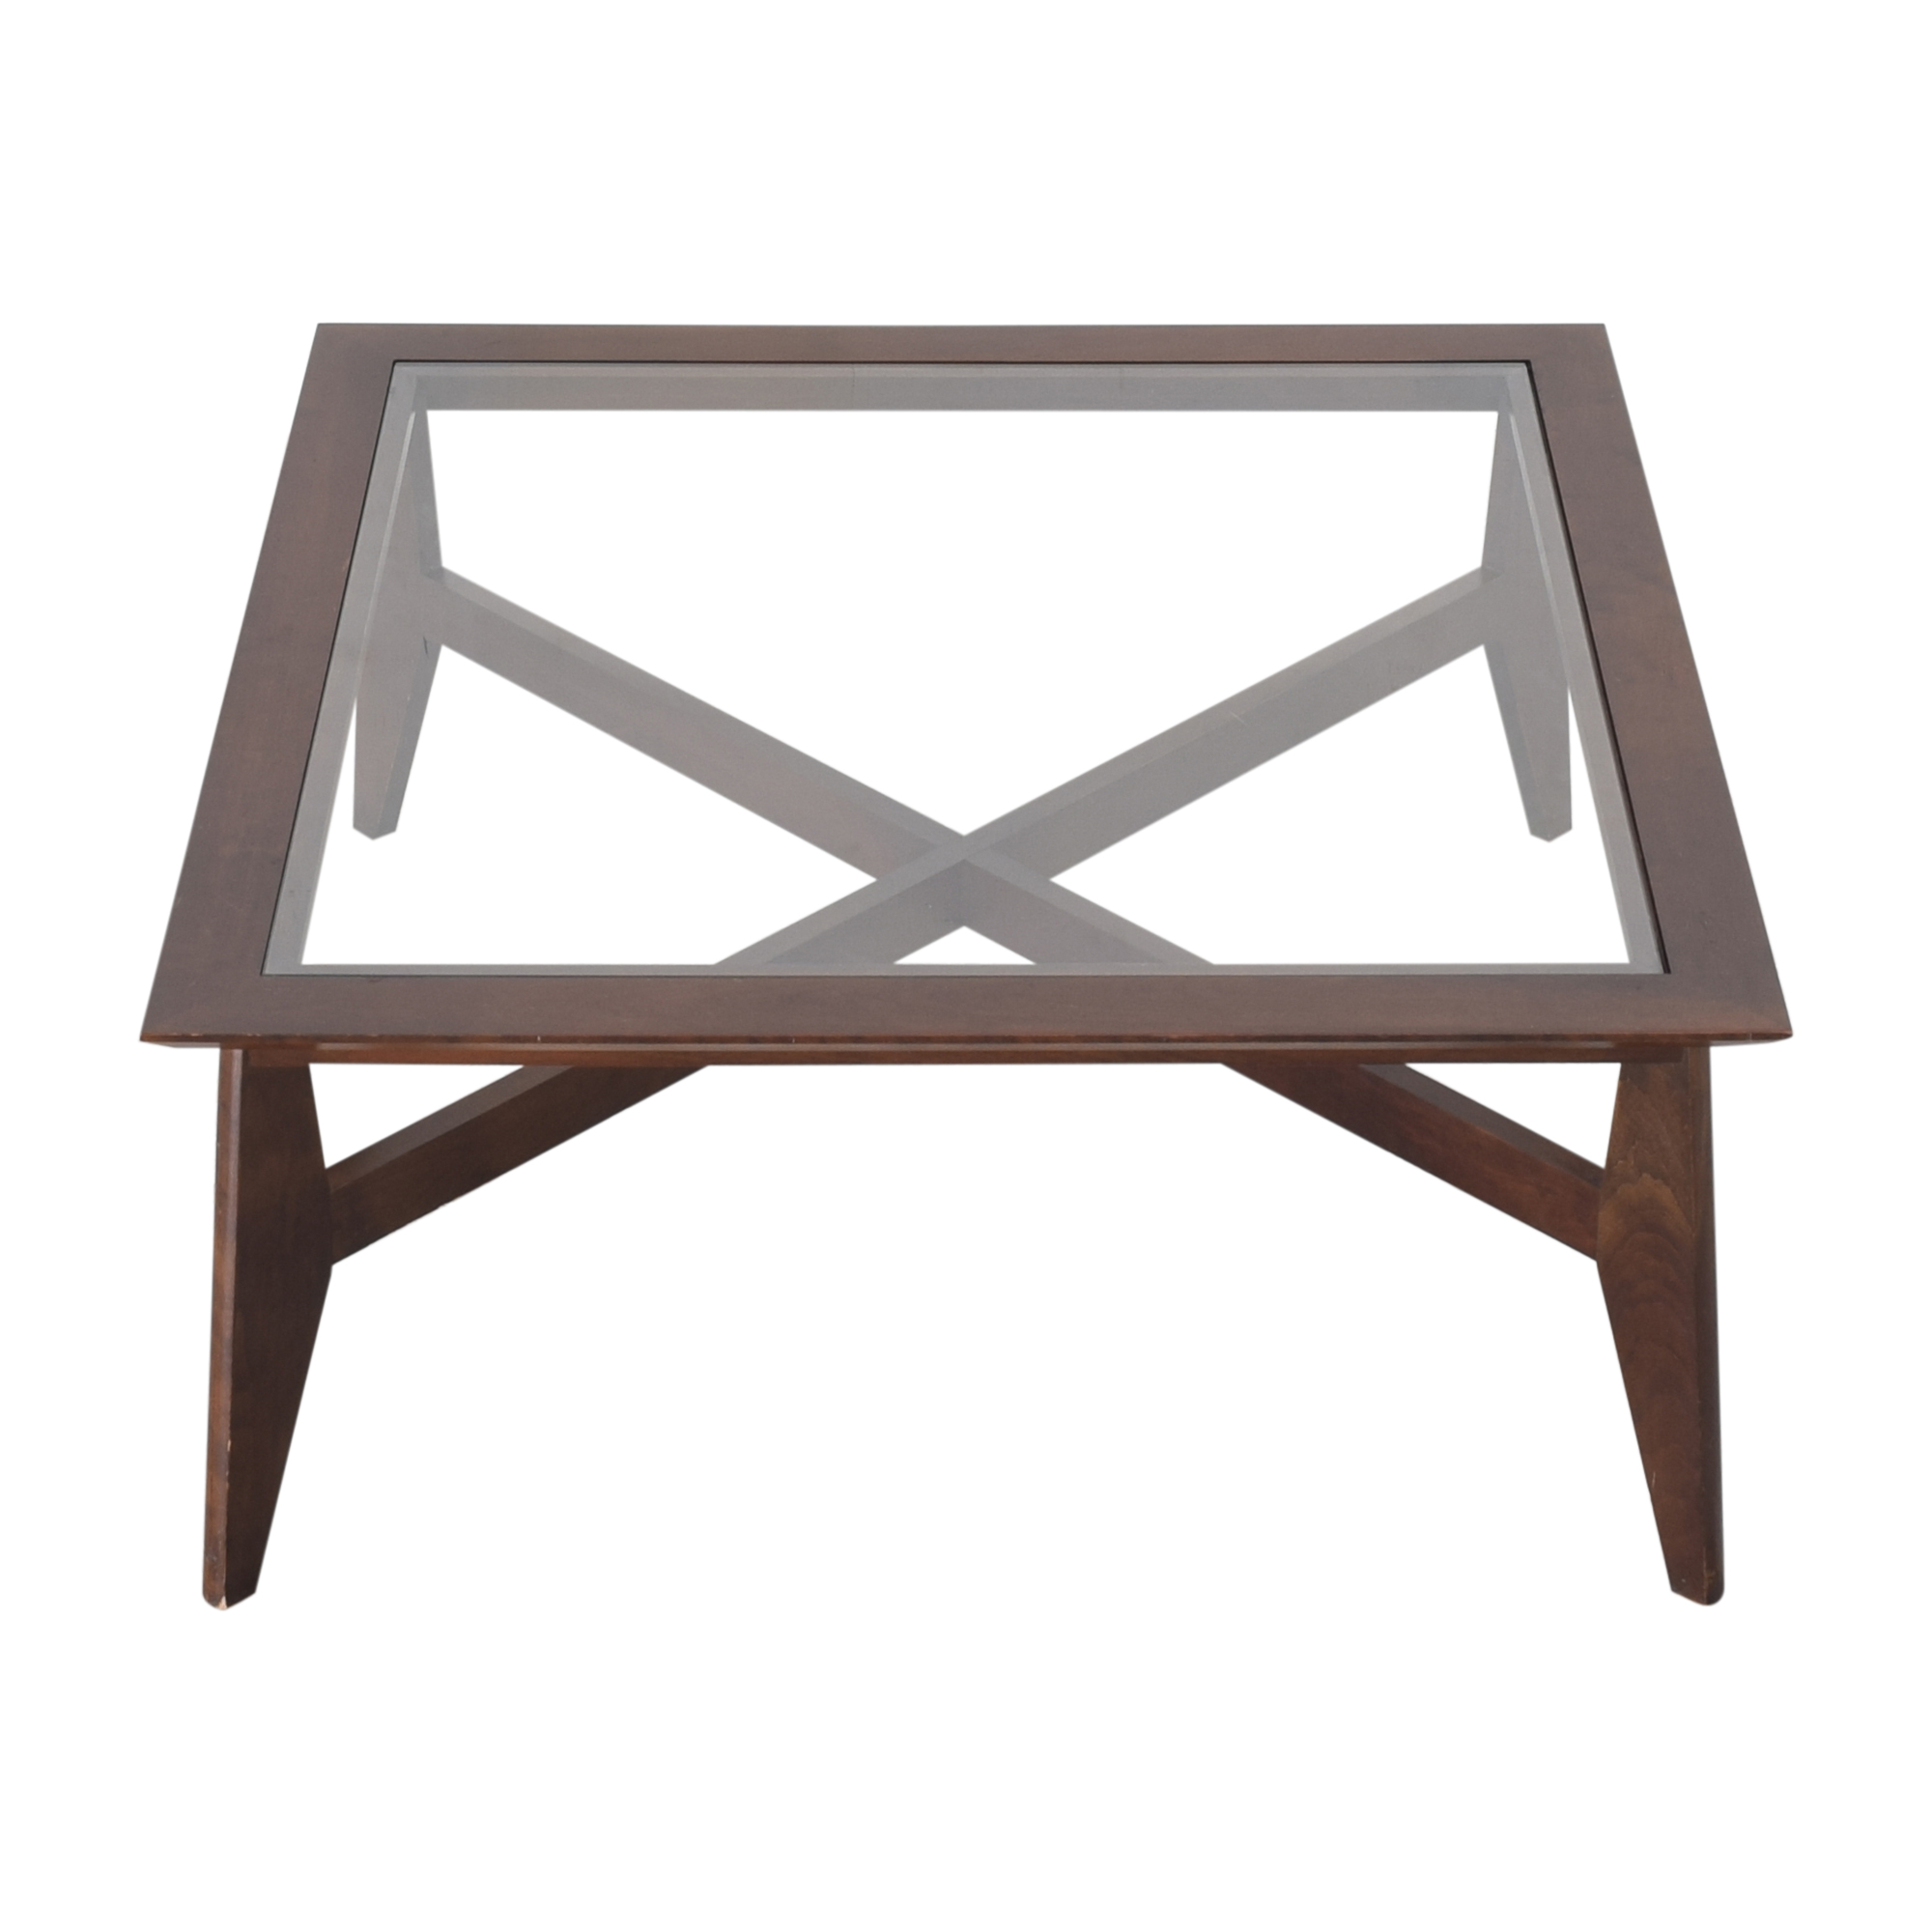 Ethan Allen Trevor Coffee Table / Coffee Tables